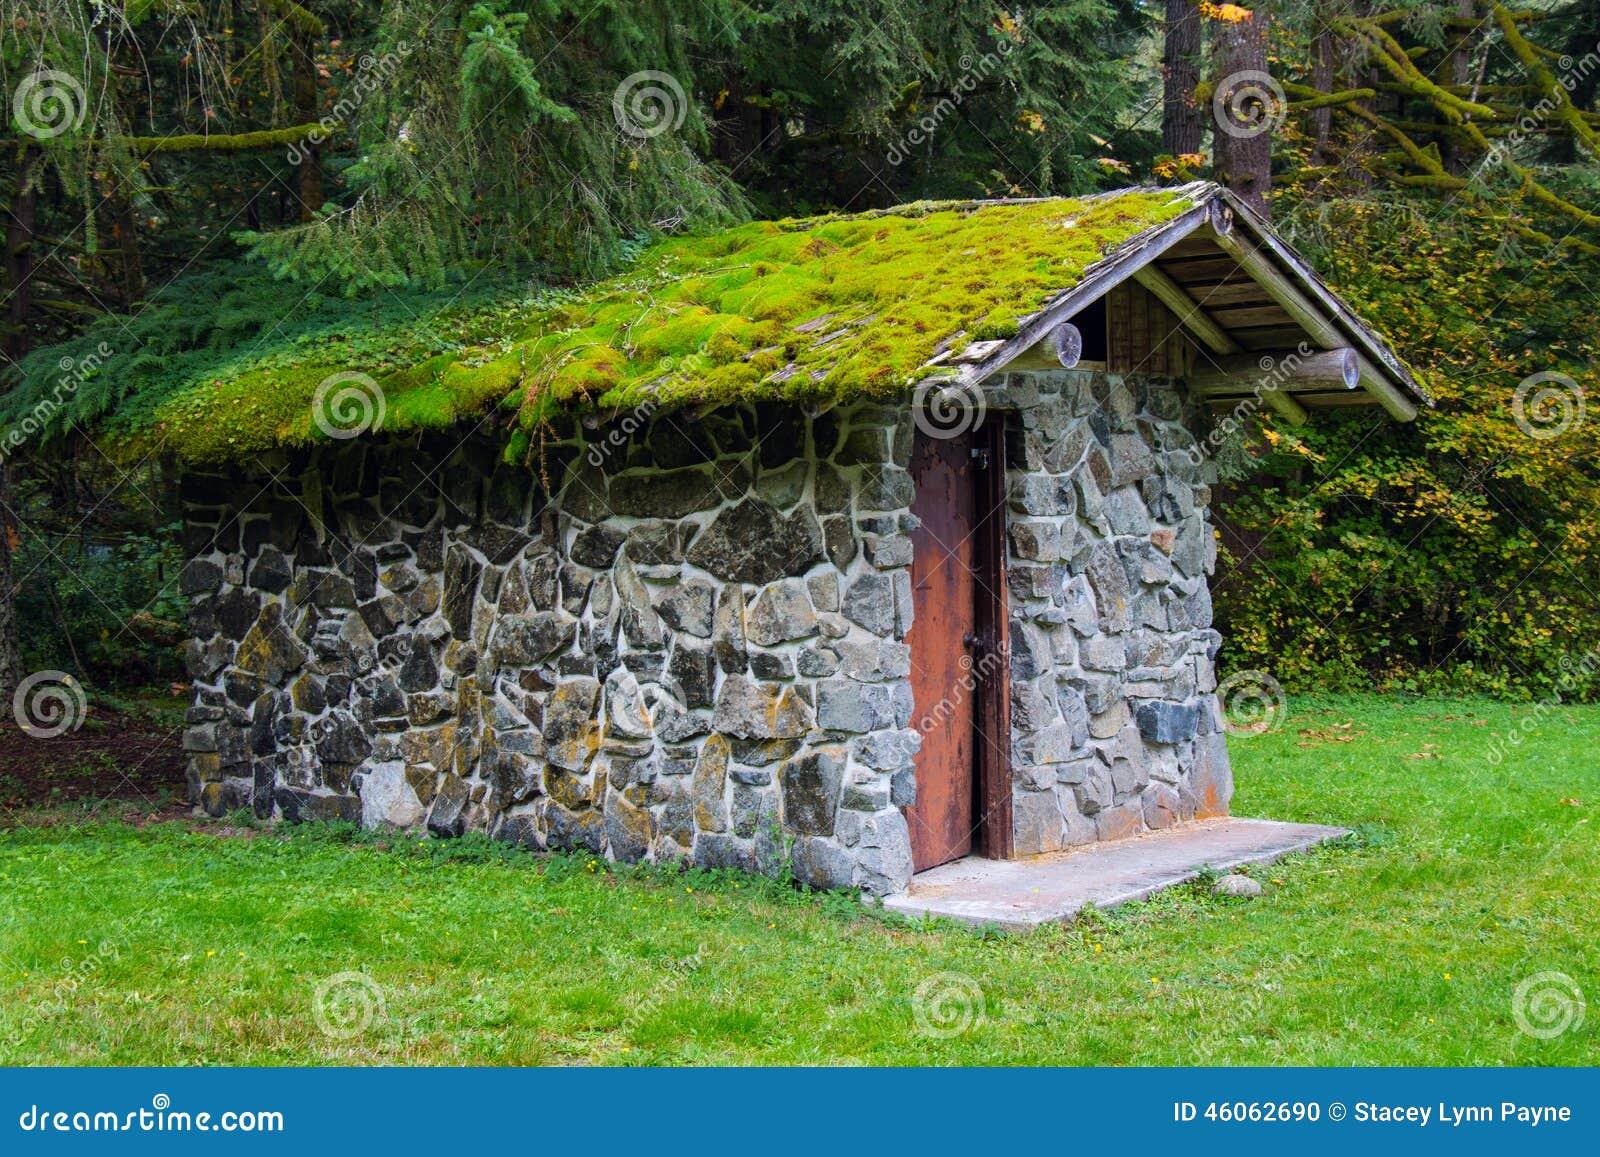 House Plans Washington State Best Free Home Design